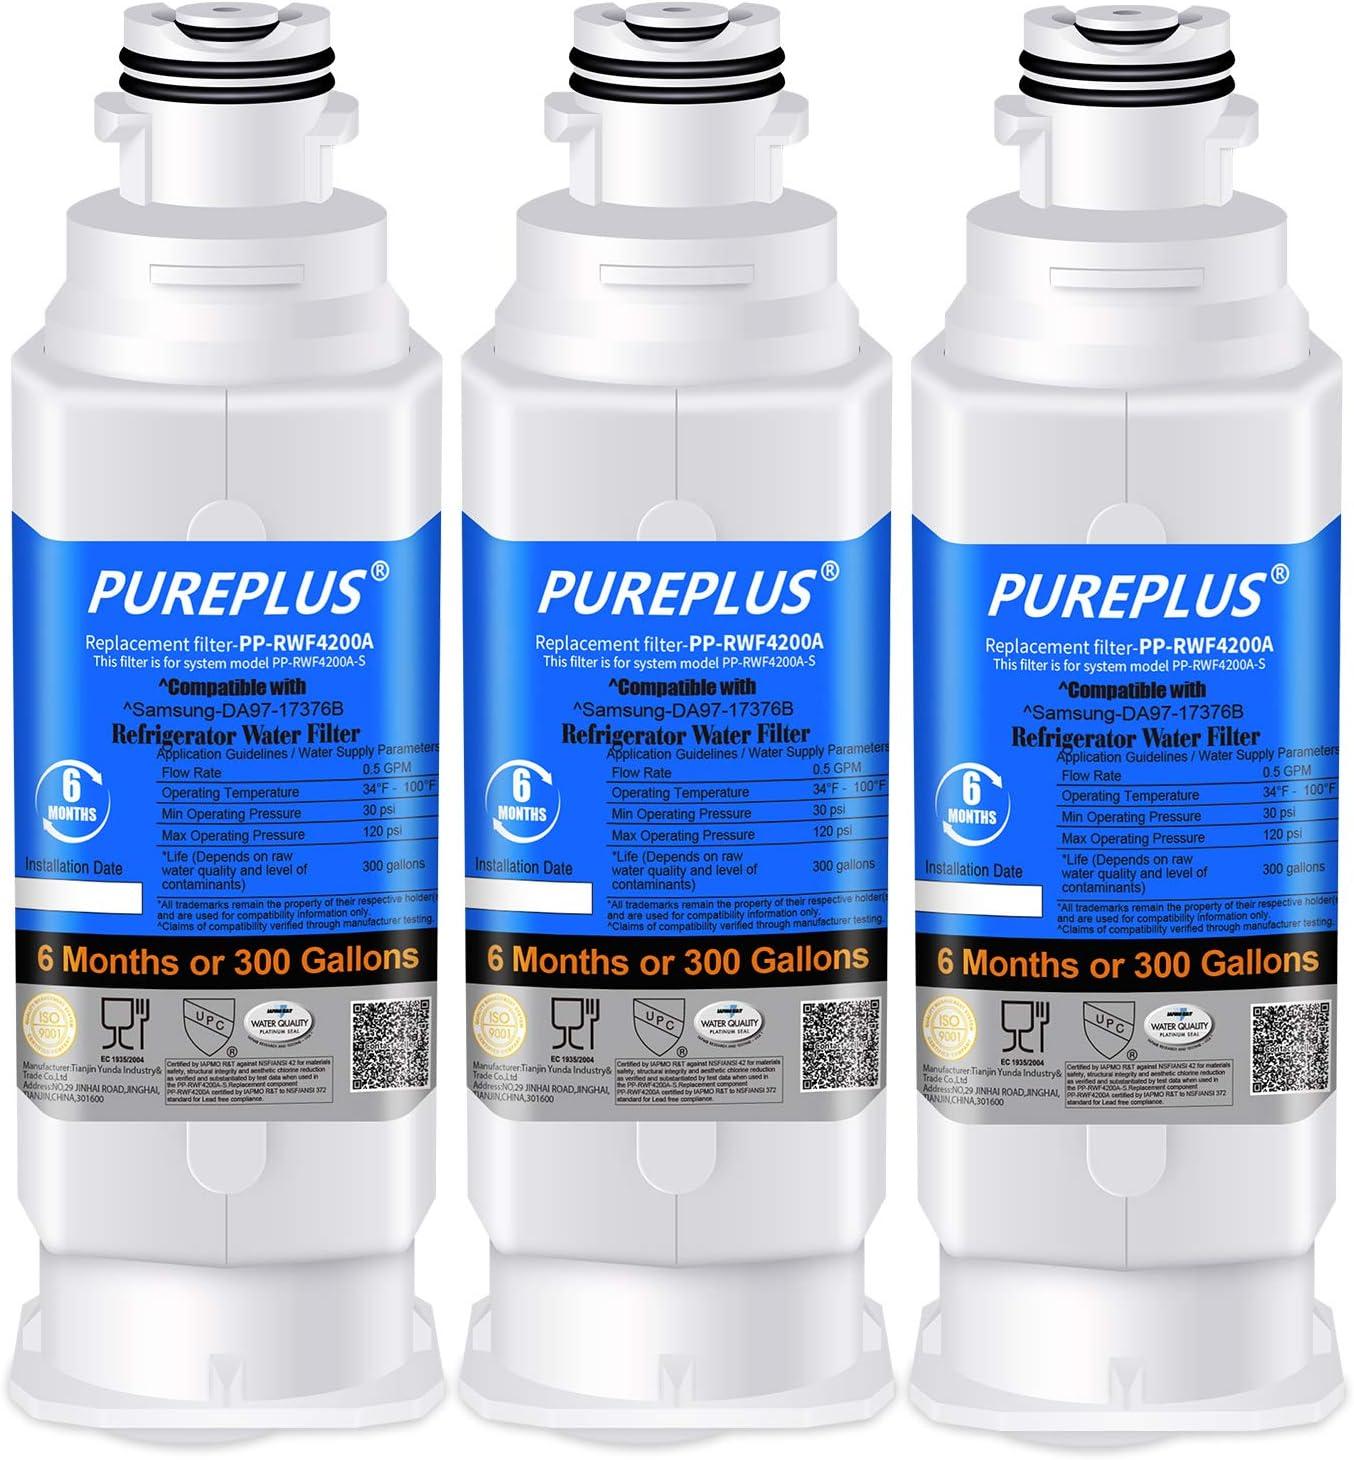 PUREPLUS DA97-17376B Replacement for Samsung HAF-QIN, HAF-QIN/EXP, DA97-08006C, RF23M8070SG, RF23M8070SR, RF23M8090SG, RF23M8090SR, RF23M8570SR, RF23M8590SG Refrigerator Water Filter, 3Pack